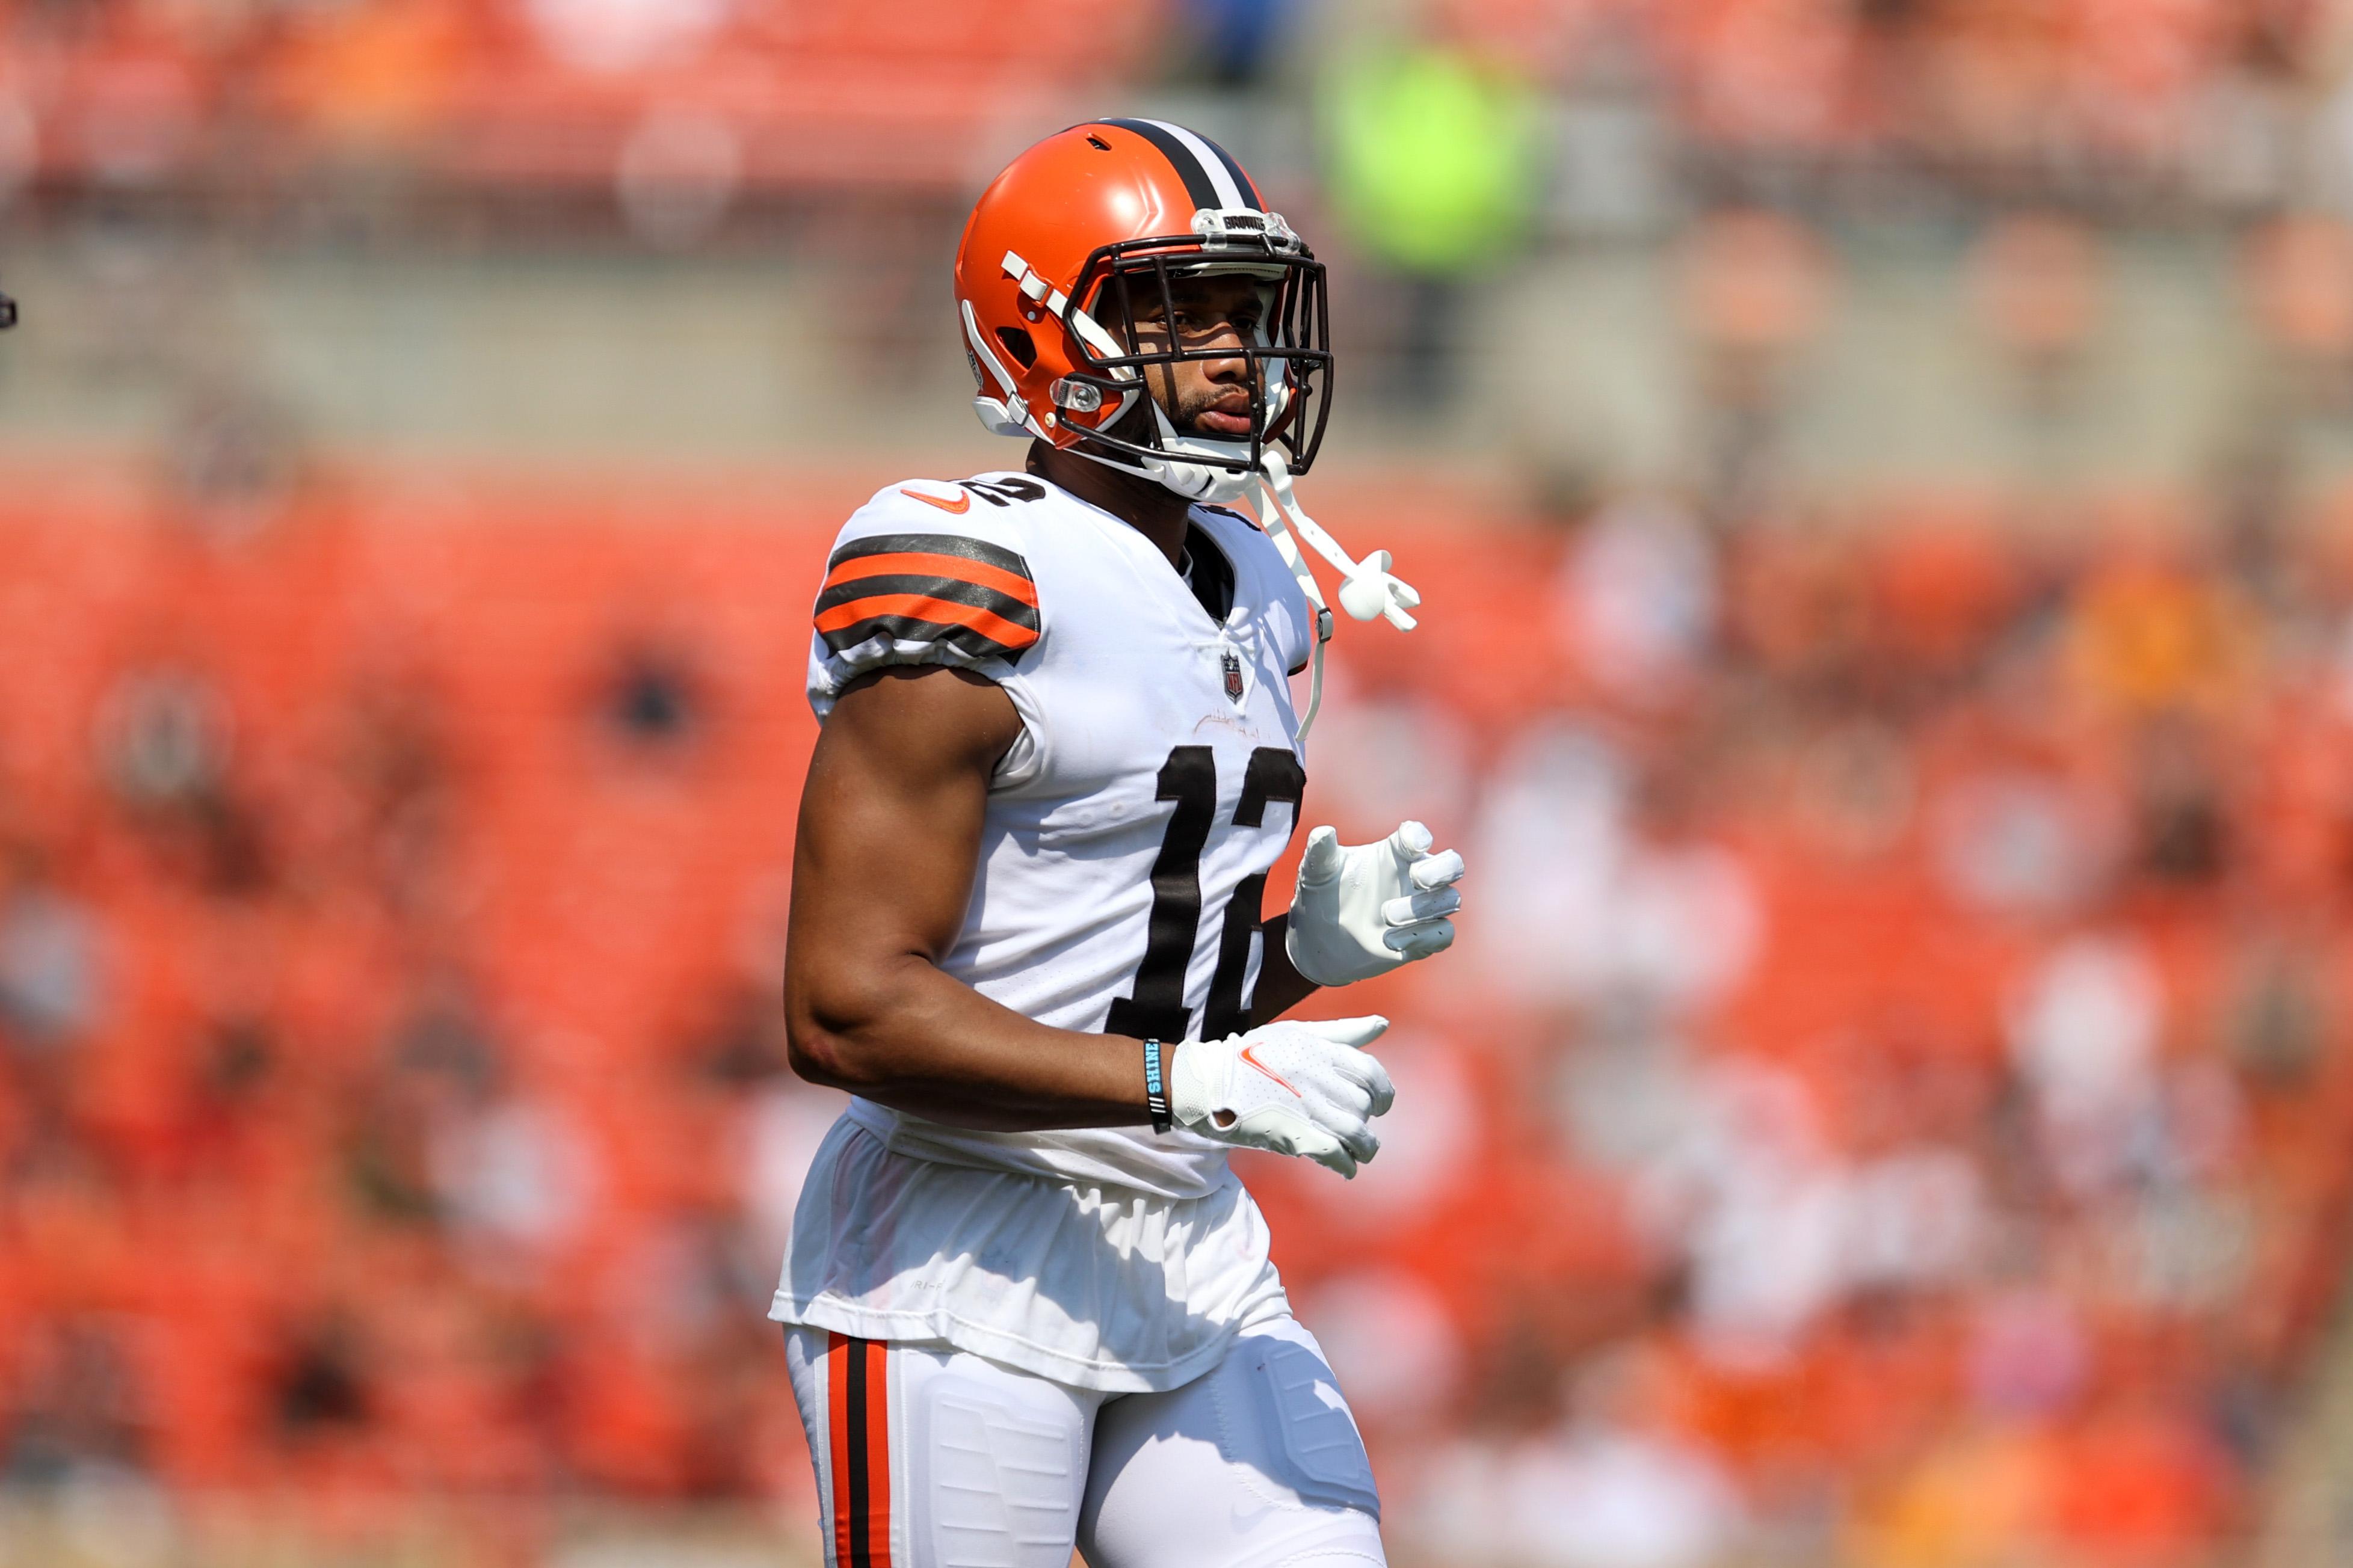 NFL: AUG 22 Preseason - Giants at Browns